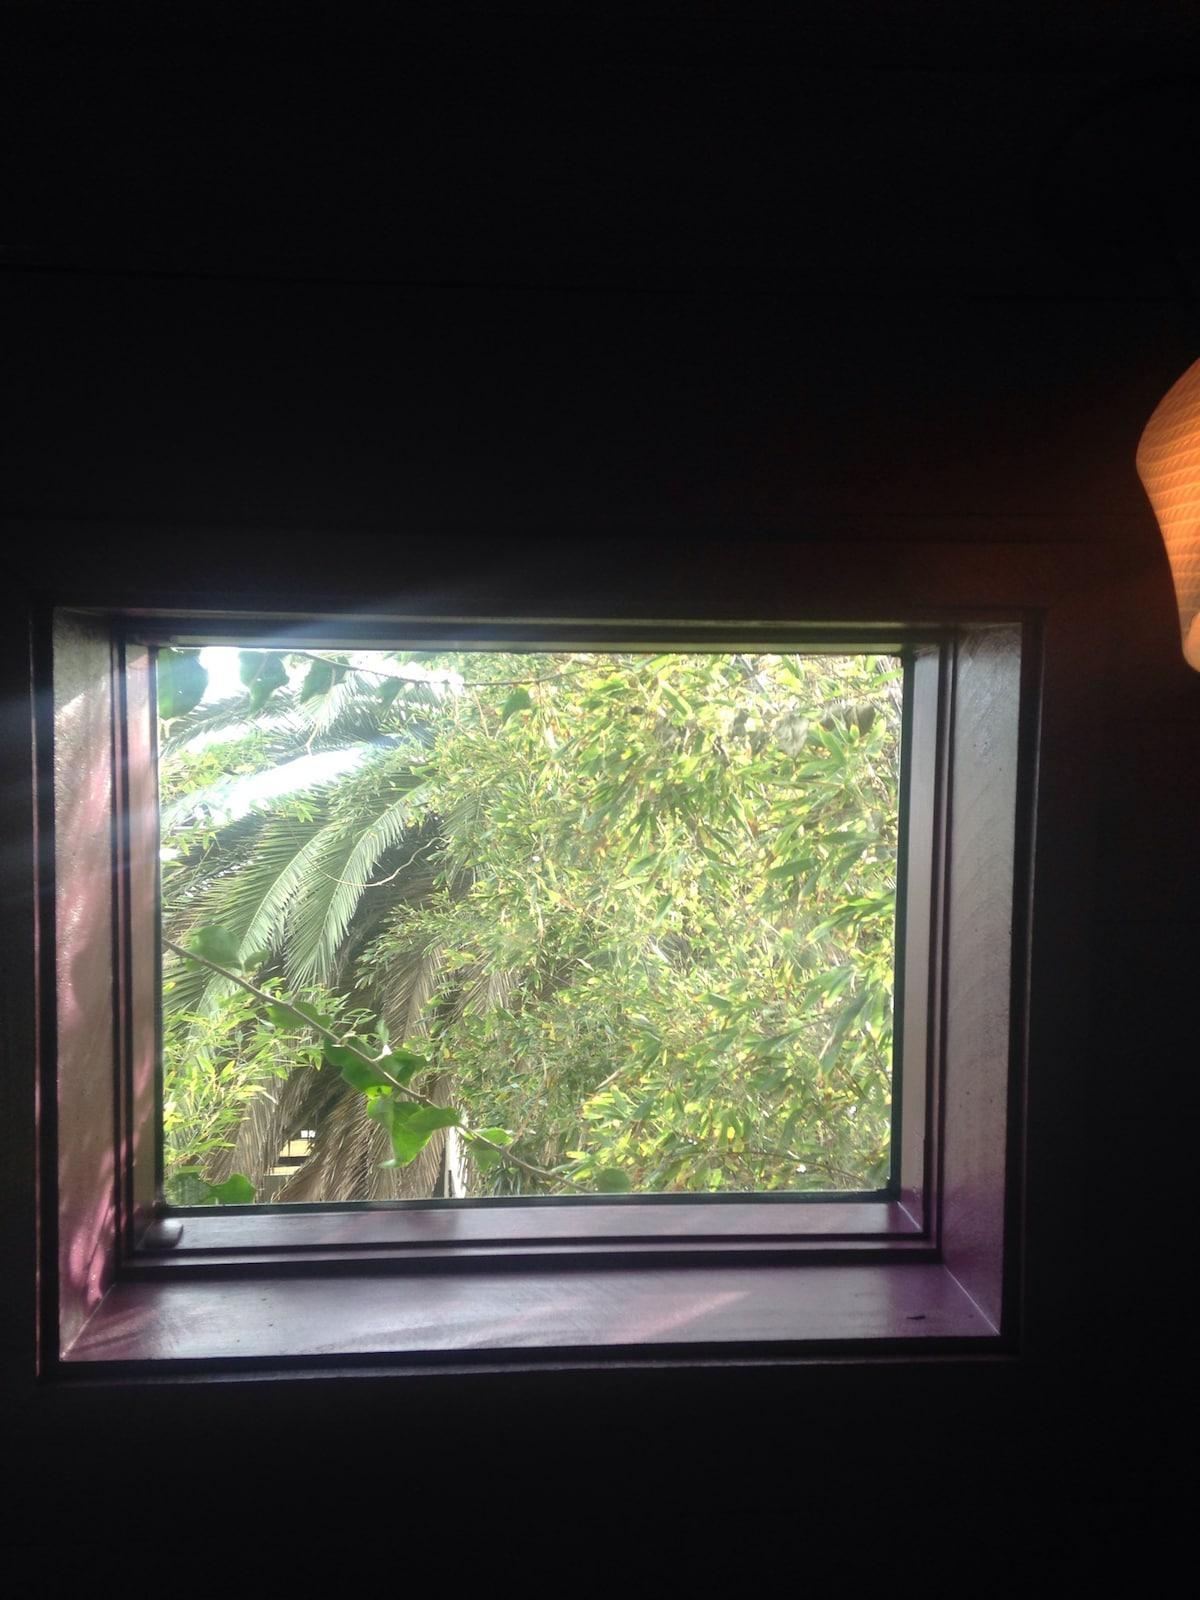 Beautifully rustling bamboo to sway you awake in the morning